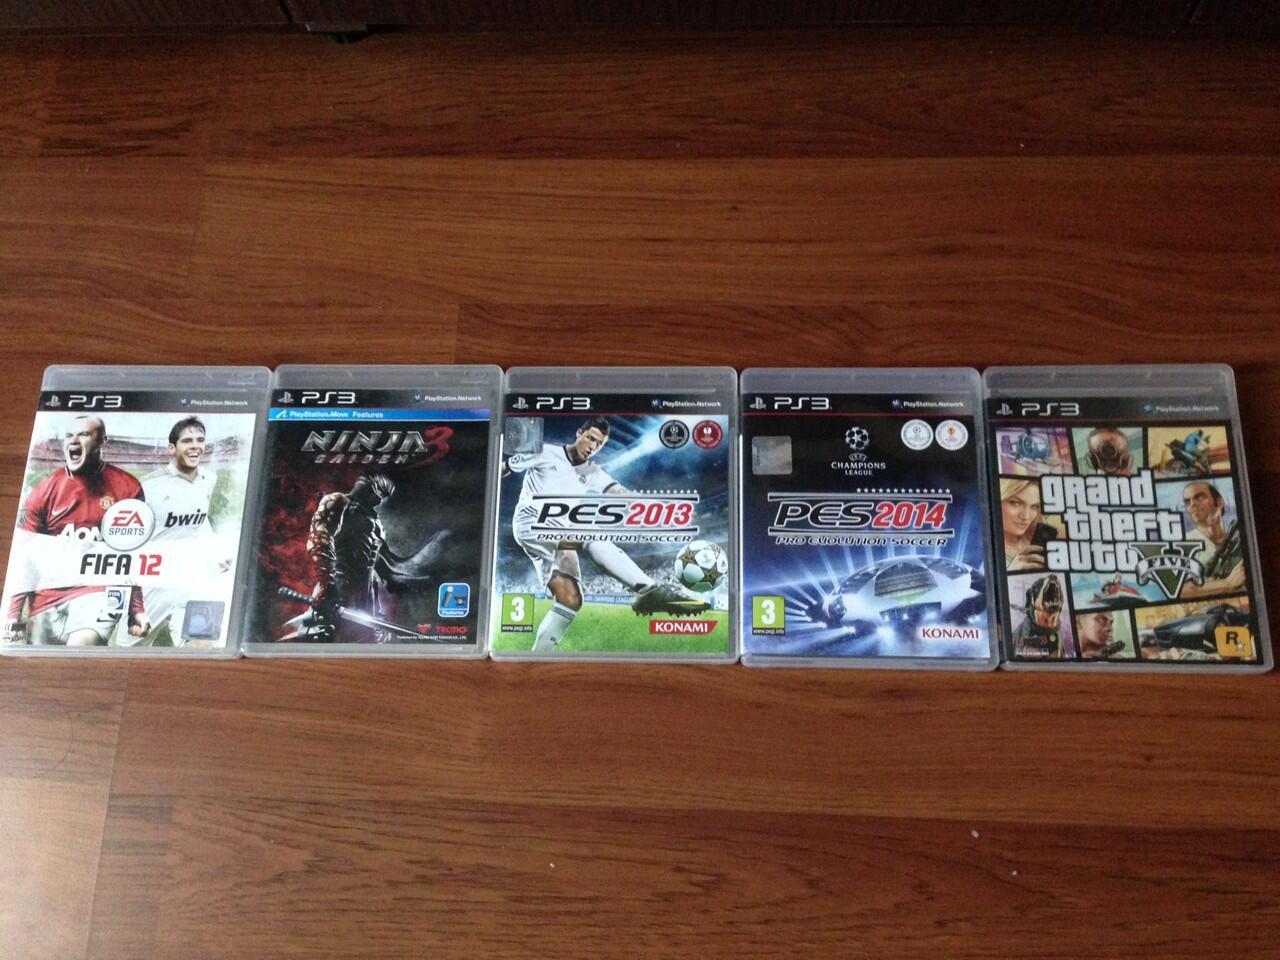 BD PS3 FIFA 12, NINJA GAIDEN 3, PES 2013, PES 2014, GTA V (MURAH + PAKET SUPER HEMAT)